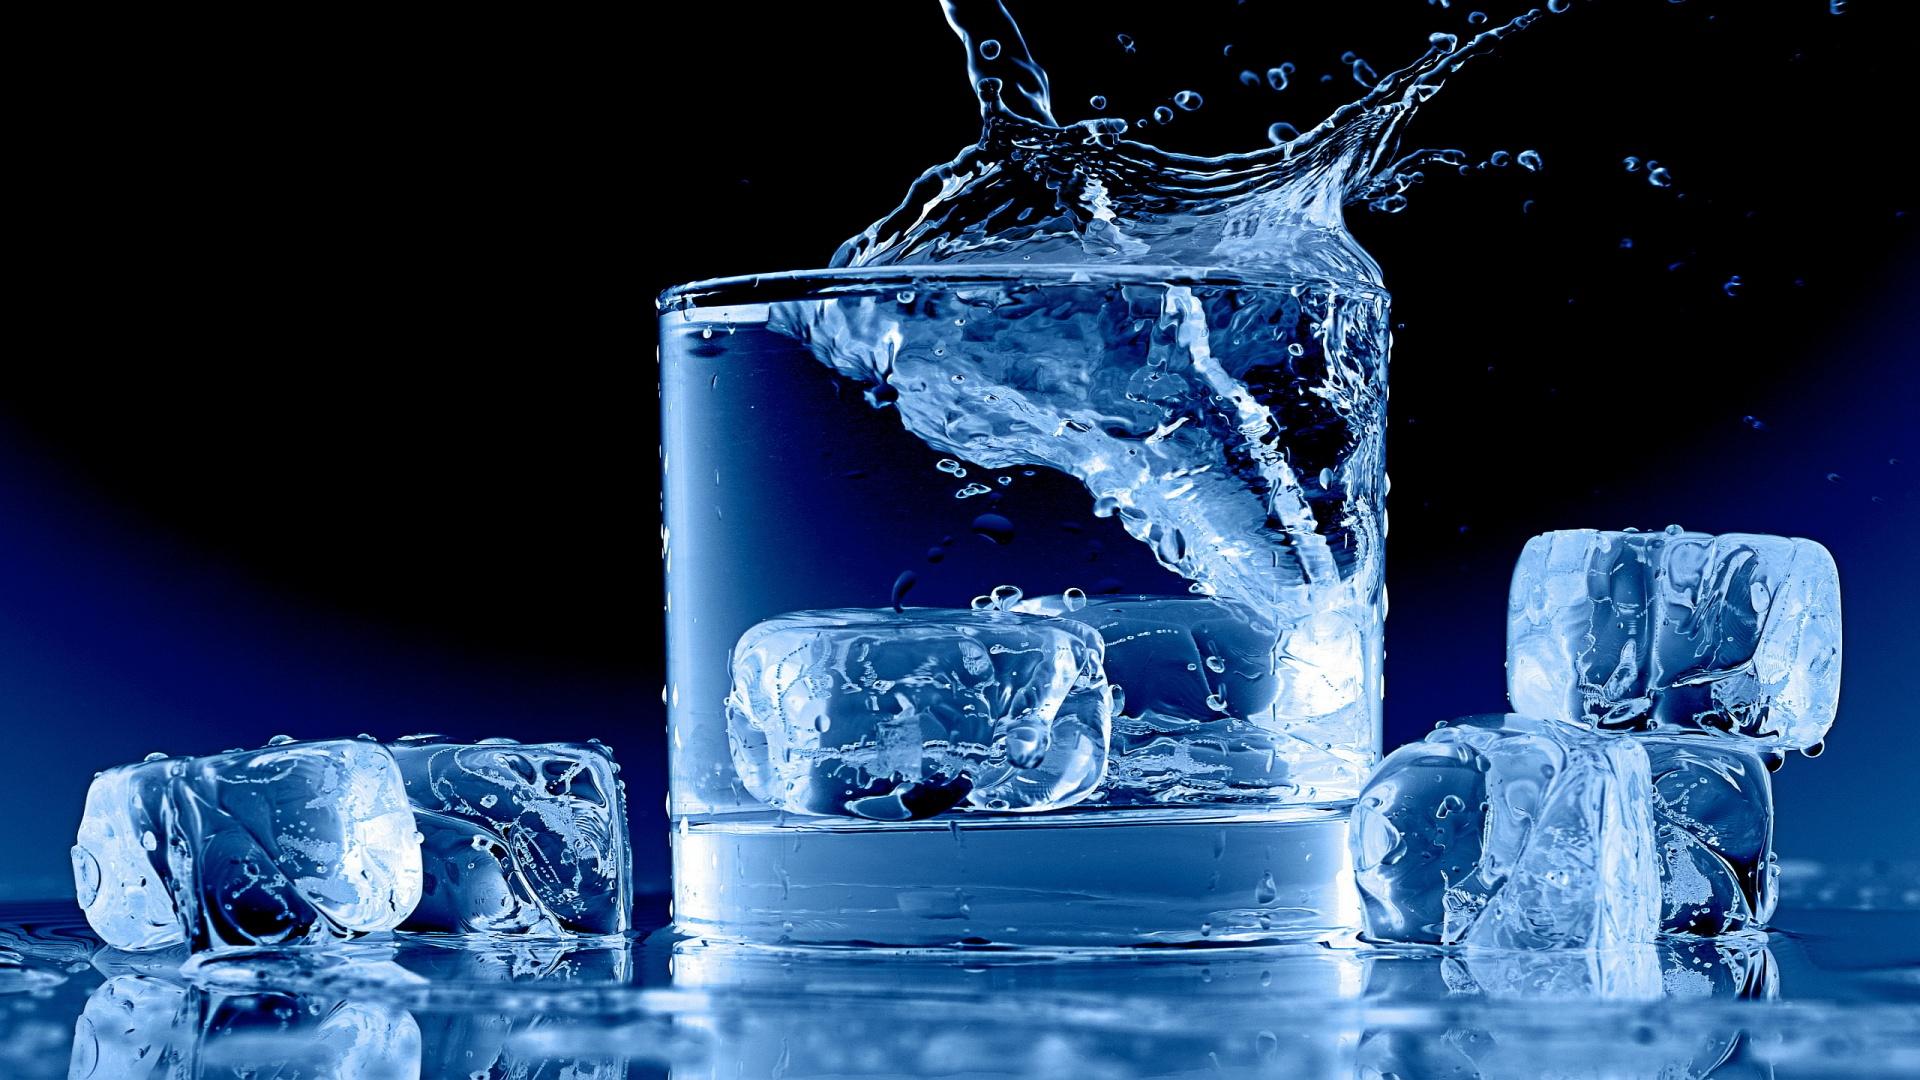 ice-splash-drink-1920x1080